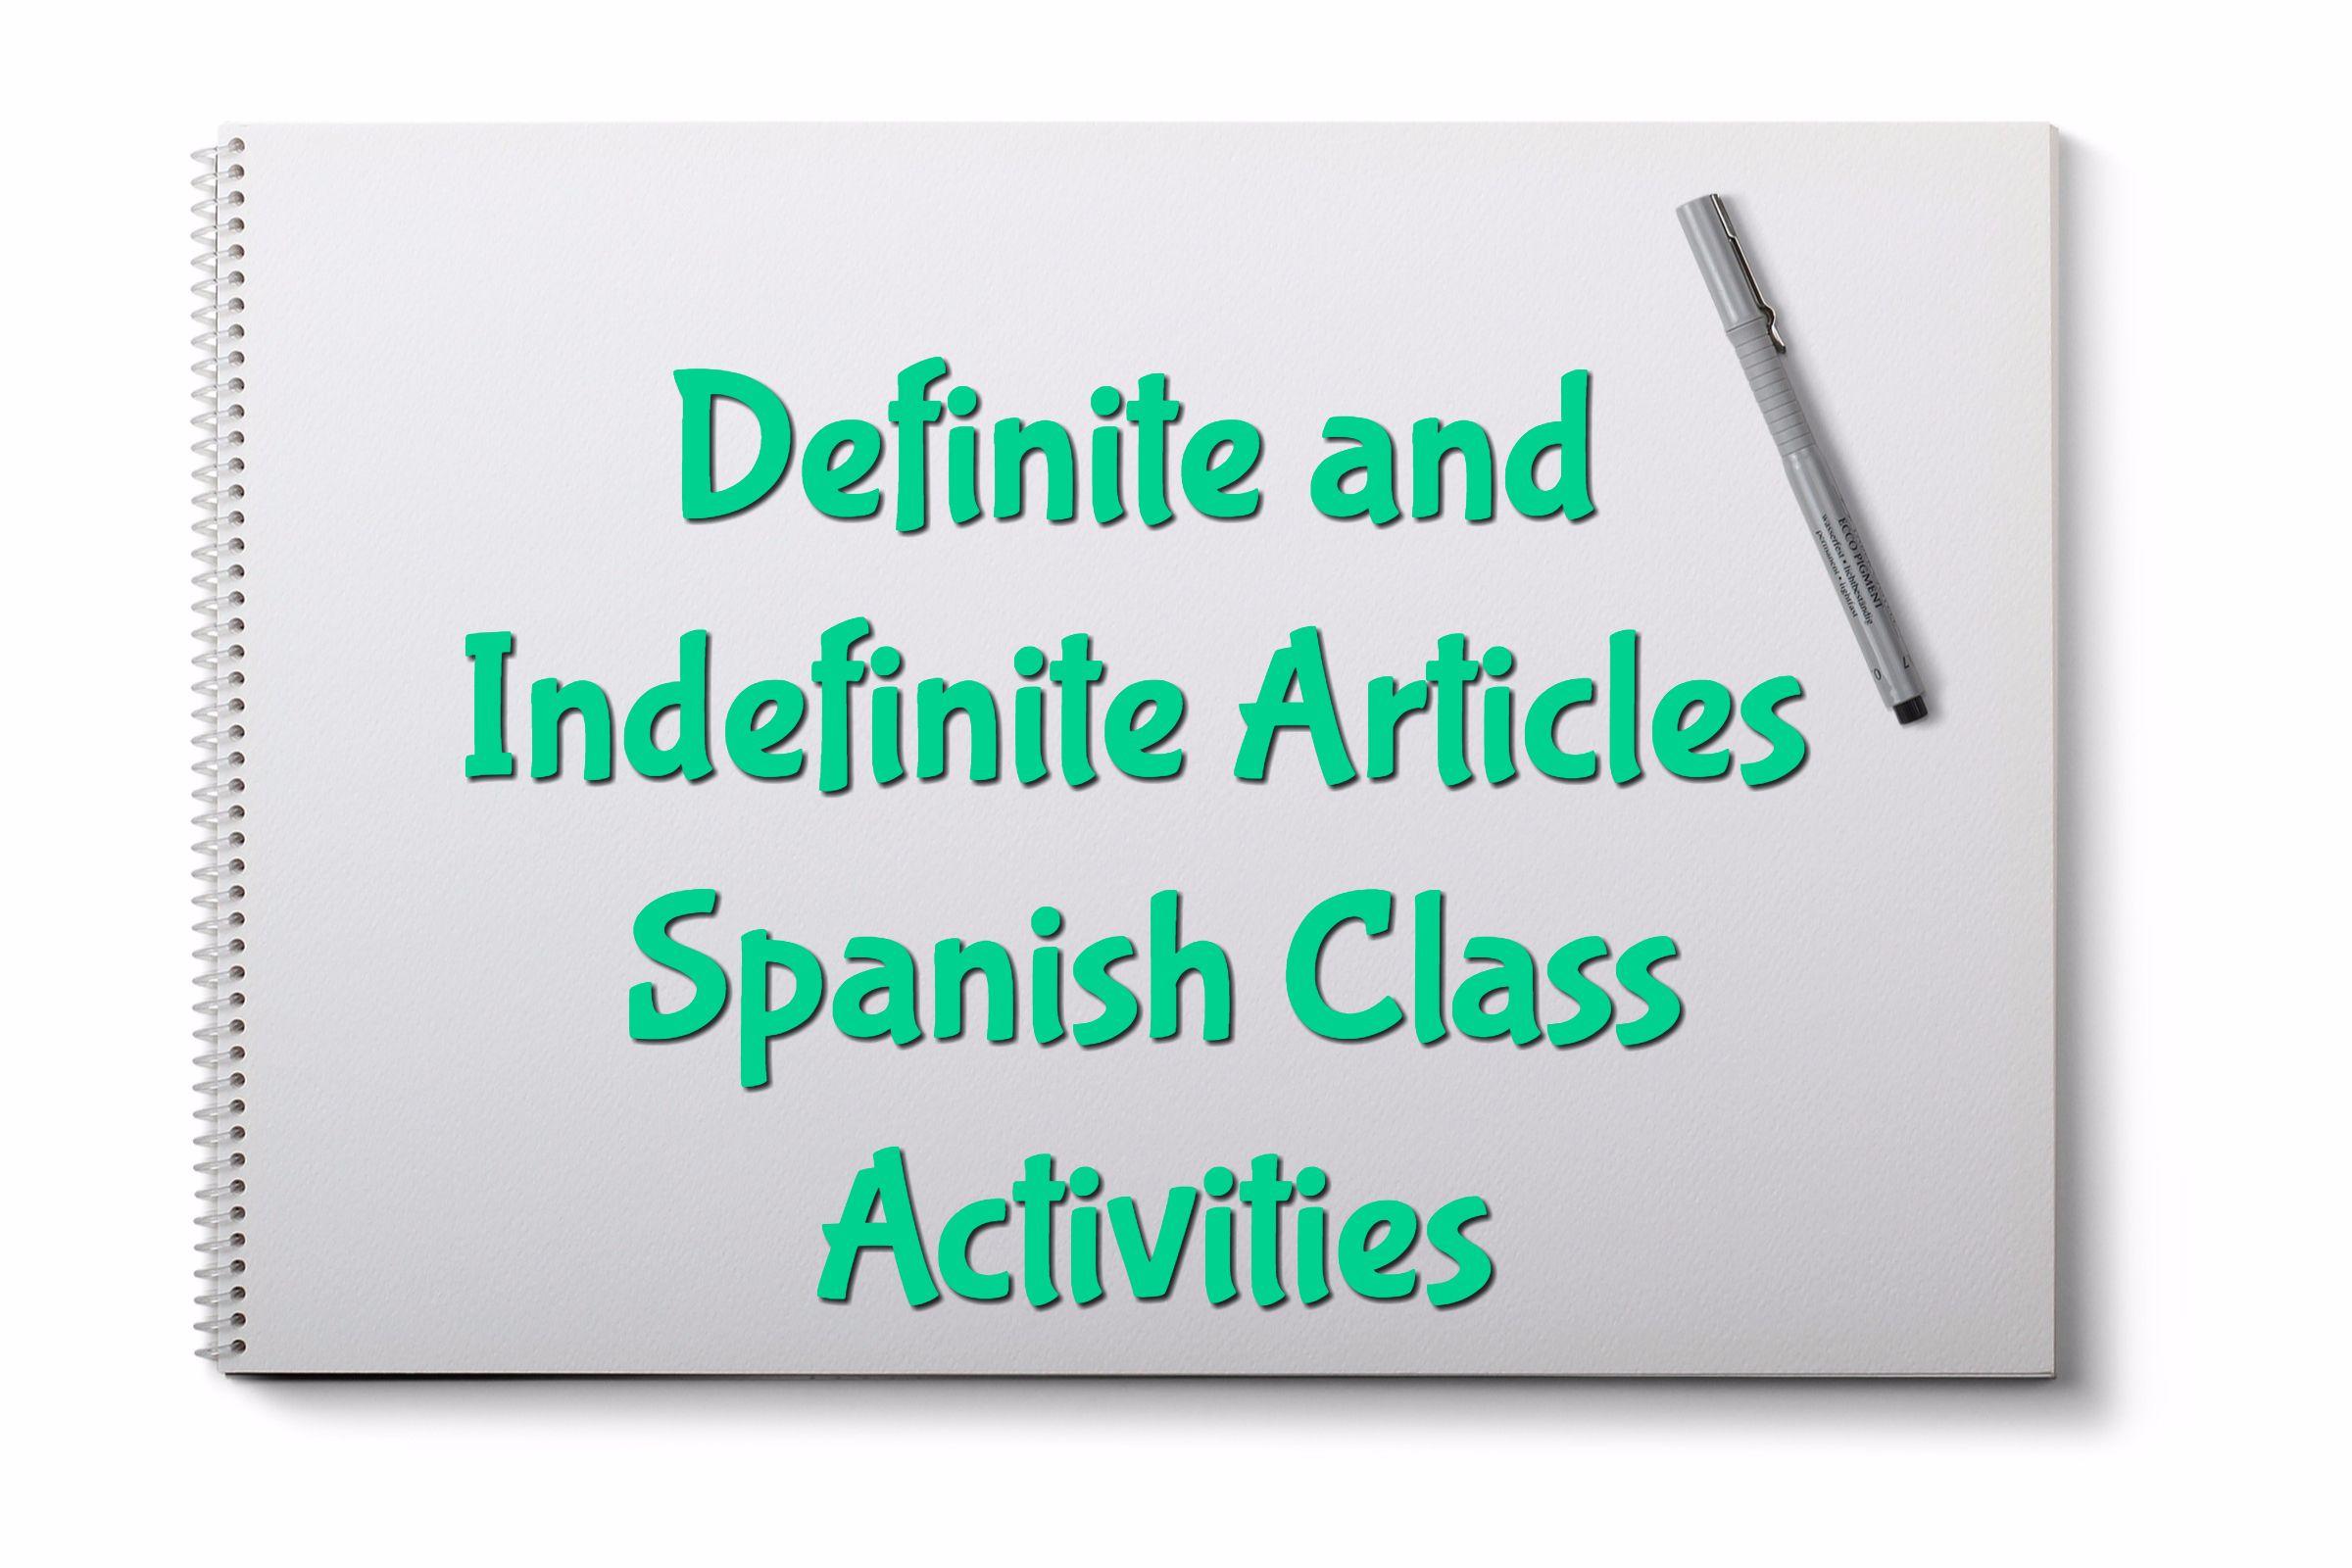 Definite And Indefinite Articles Spanish Class Activities Definite And Indefinite Articles Class Activities Articles Activities